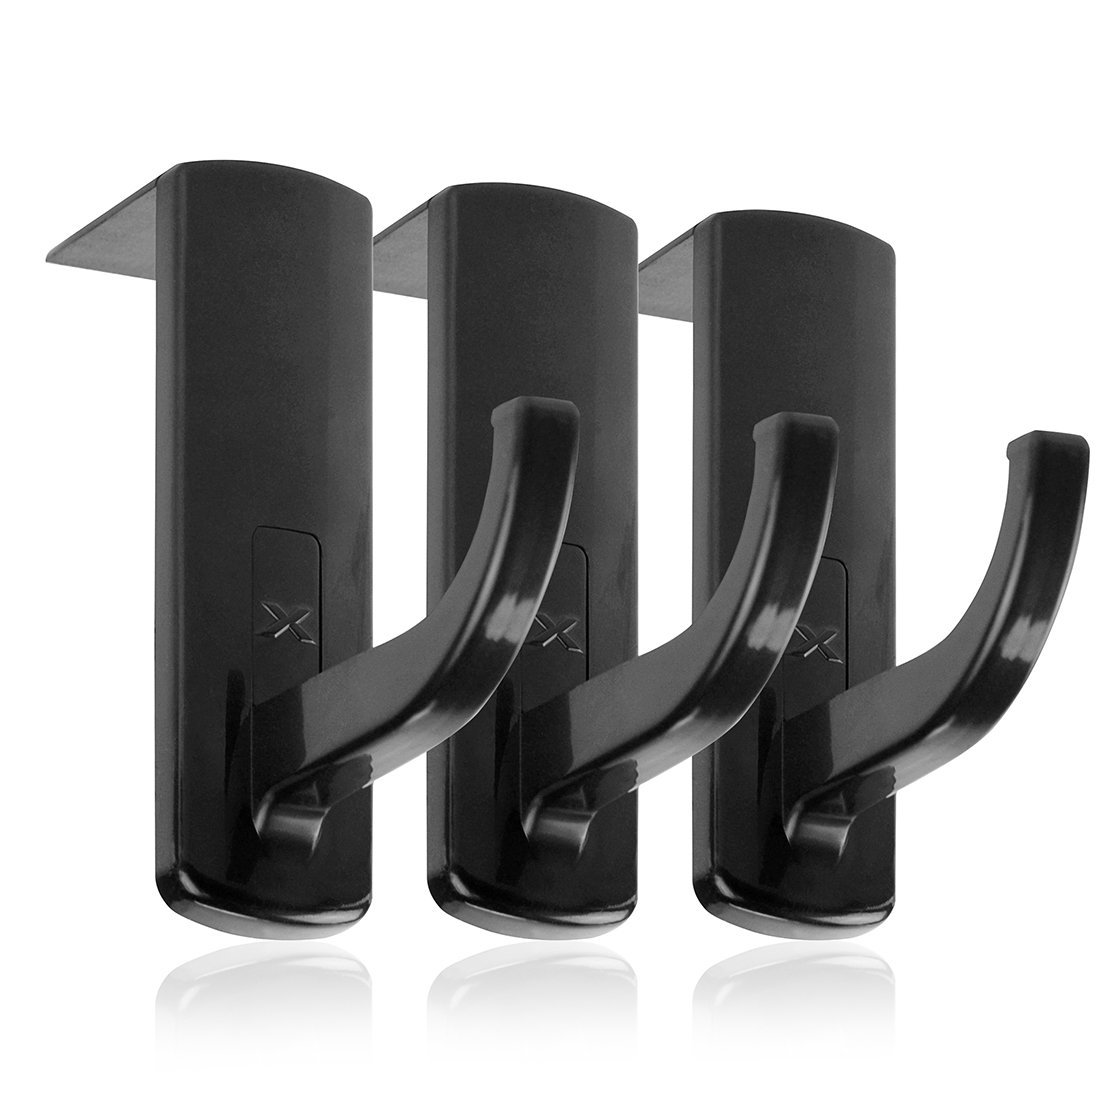 Headphones Monitor Mount Hanger / Monitor Clamp Headphone Holder / Headset Stick-on Hook (Black) Geekria PJZ-0022-01